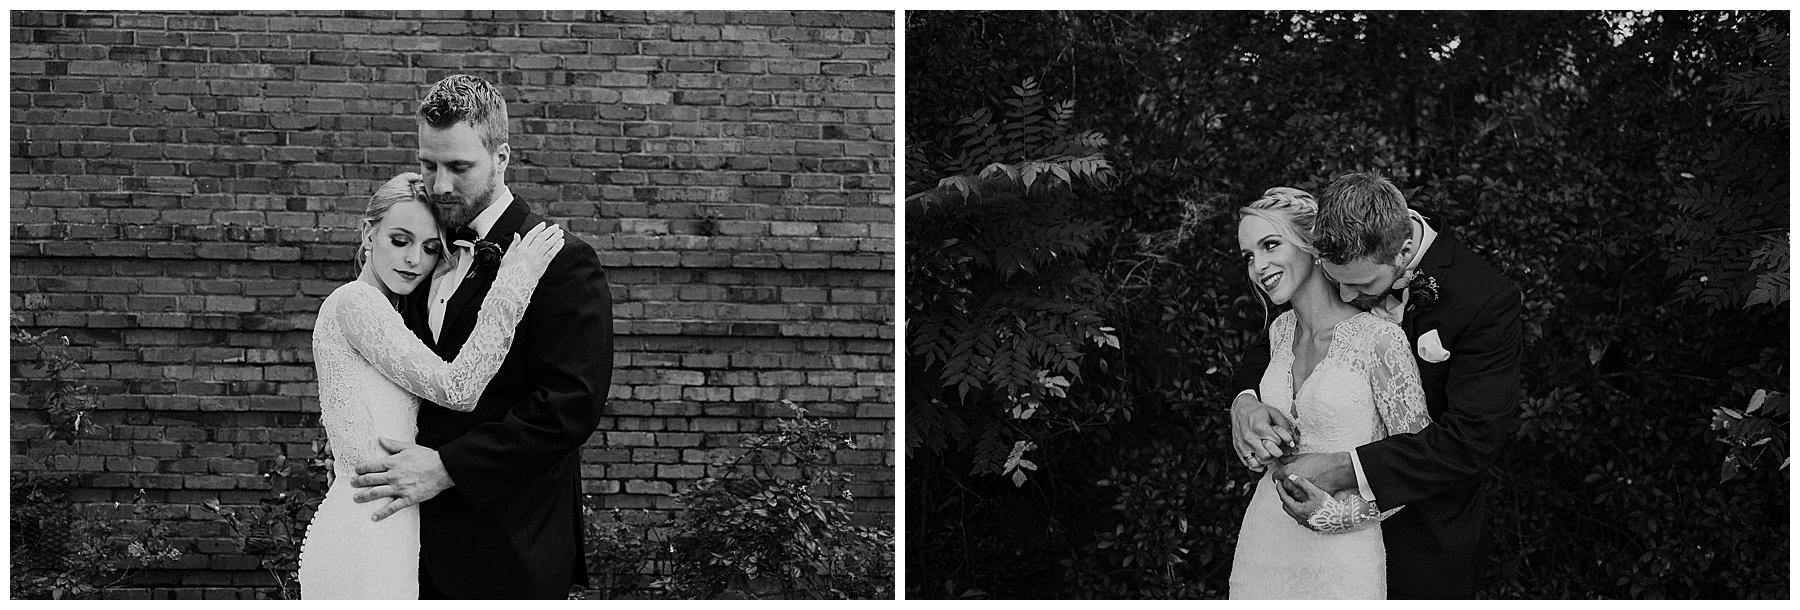 Rachel + Luke-103.jpg